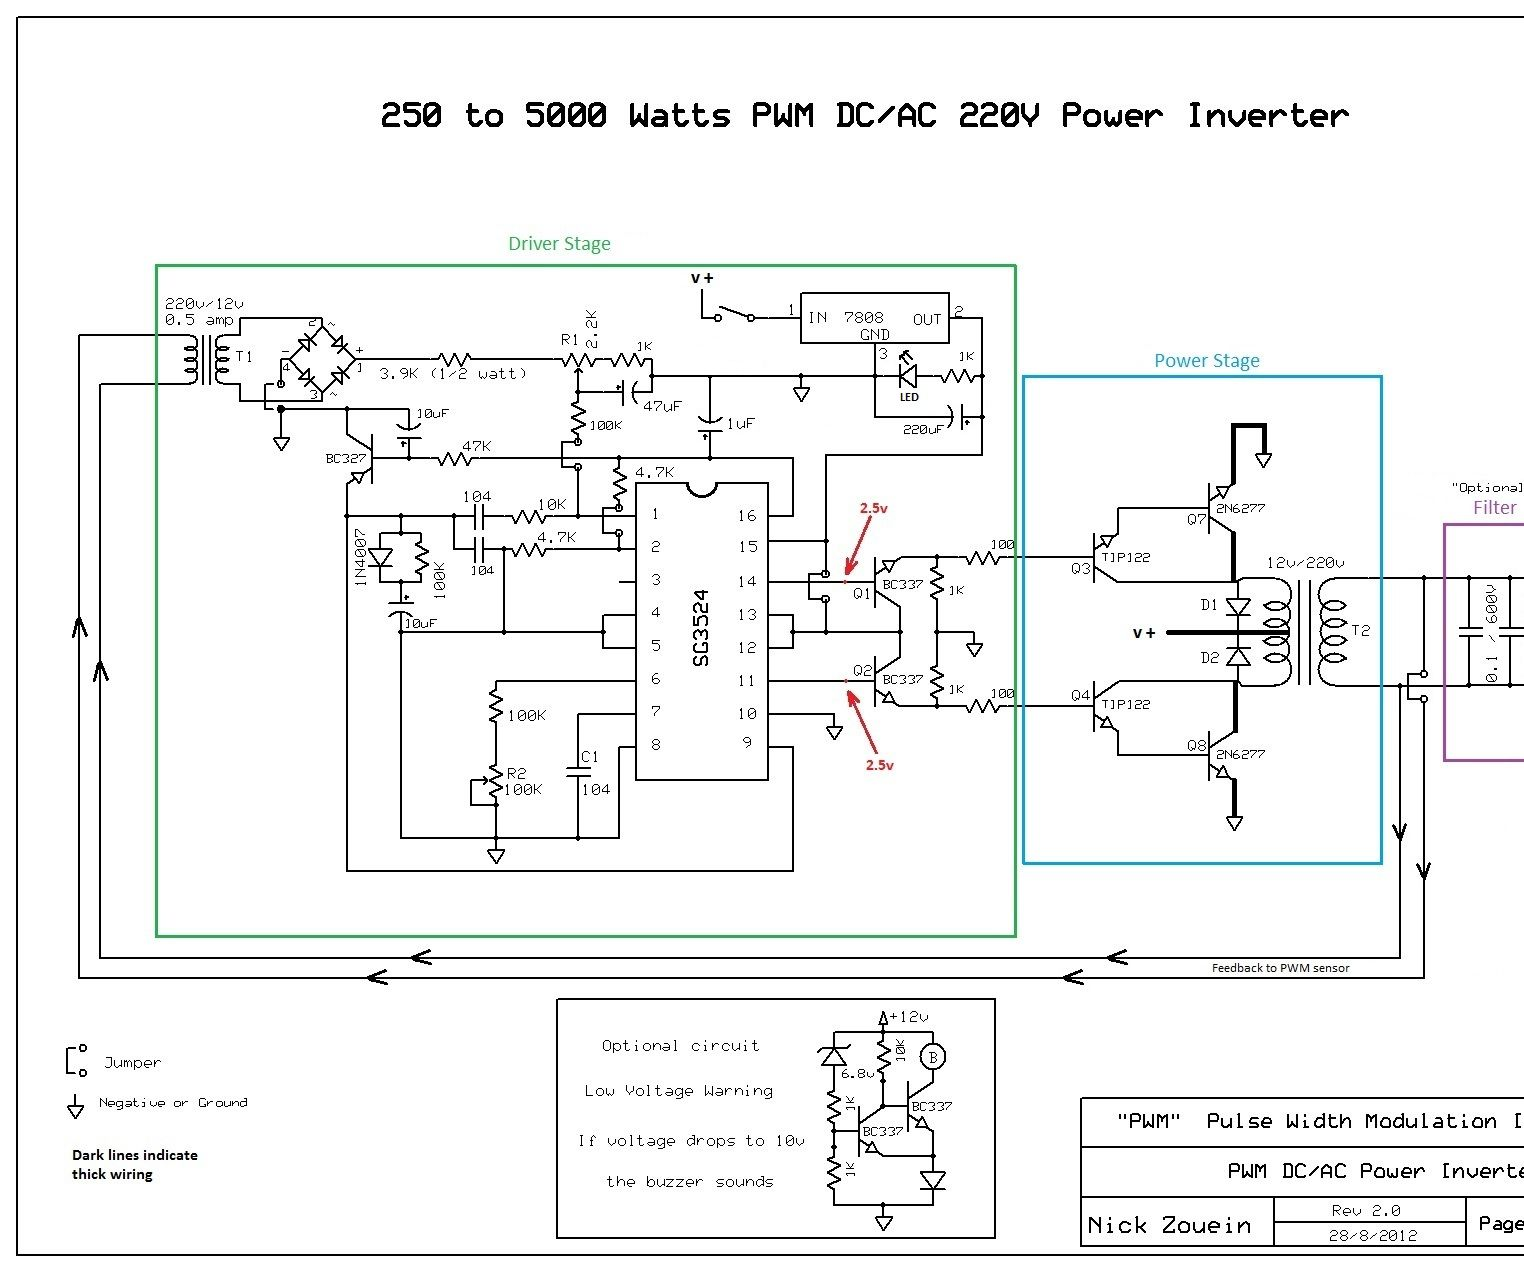 250 to 5000 Watts PWM DCAC 220V Power Inverter